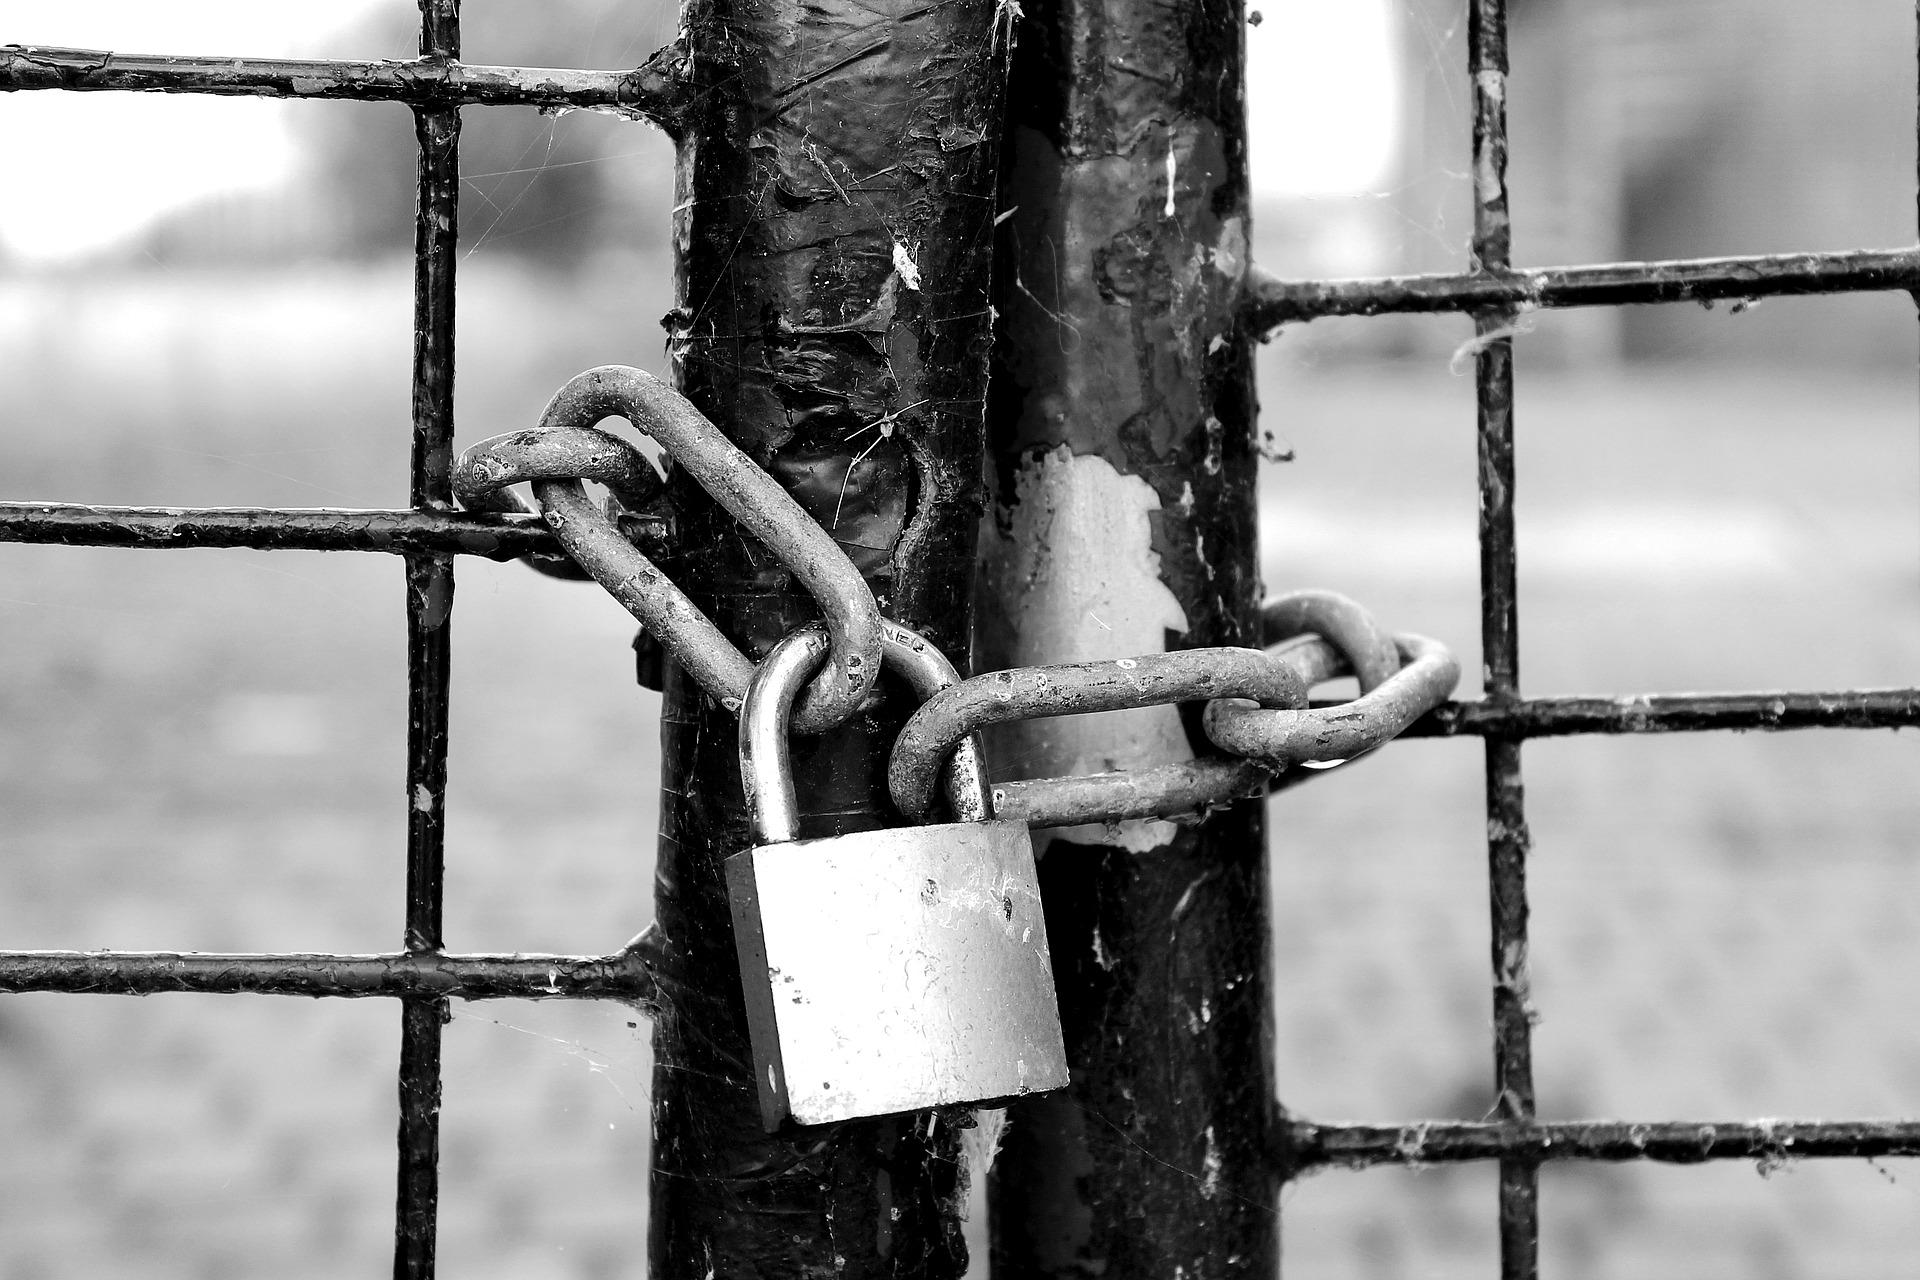 fence-1644822_1920